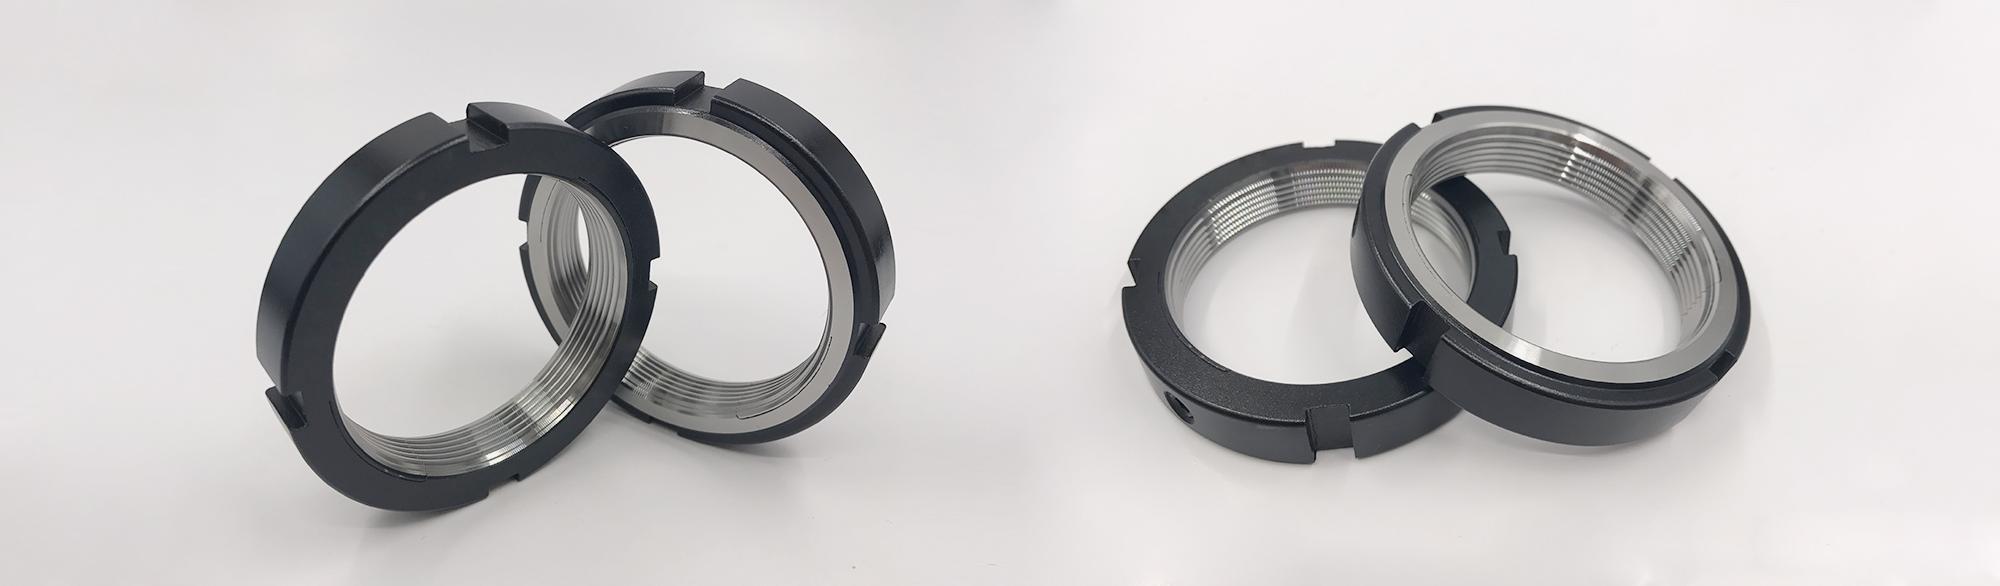 LR/LRE系列切缝型的弹片锁紧螺母